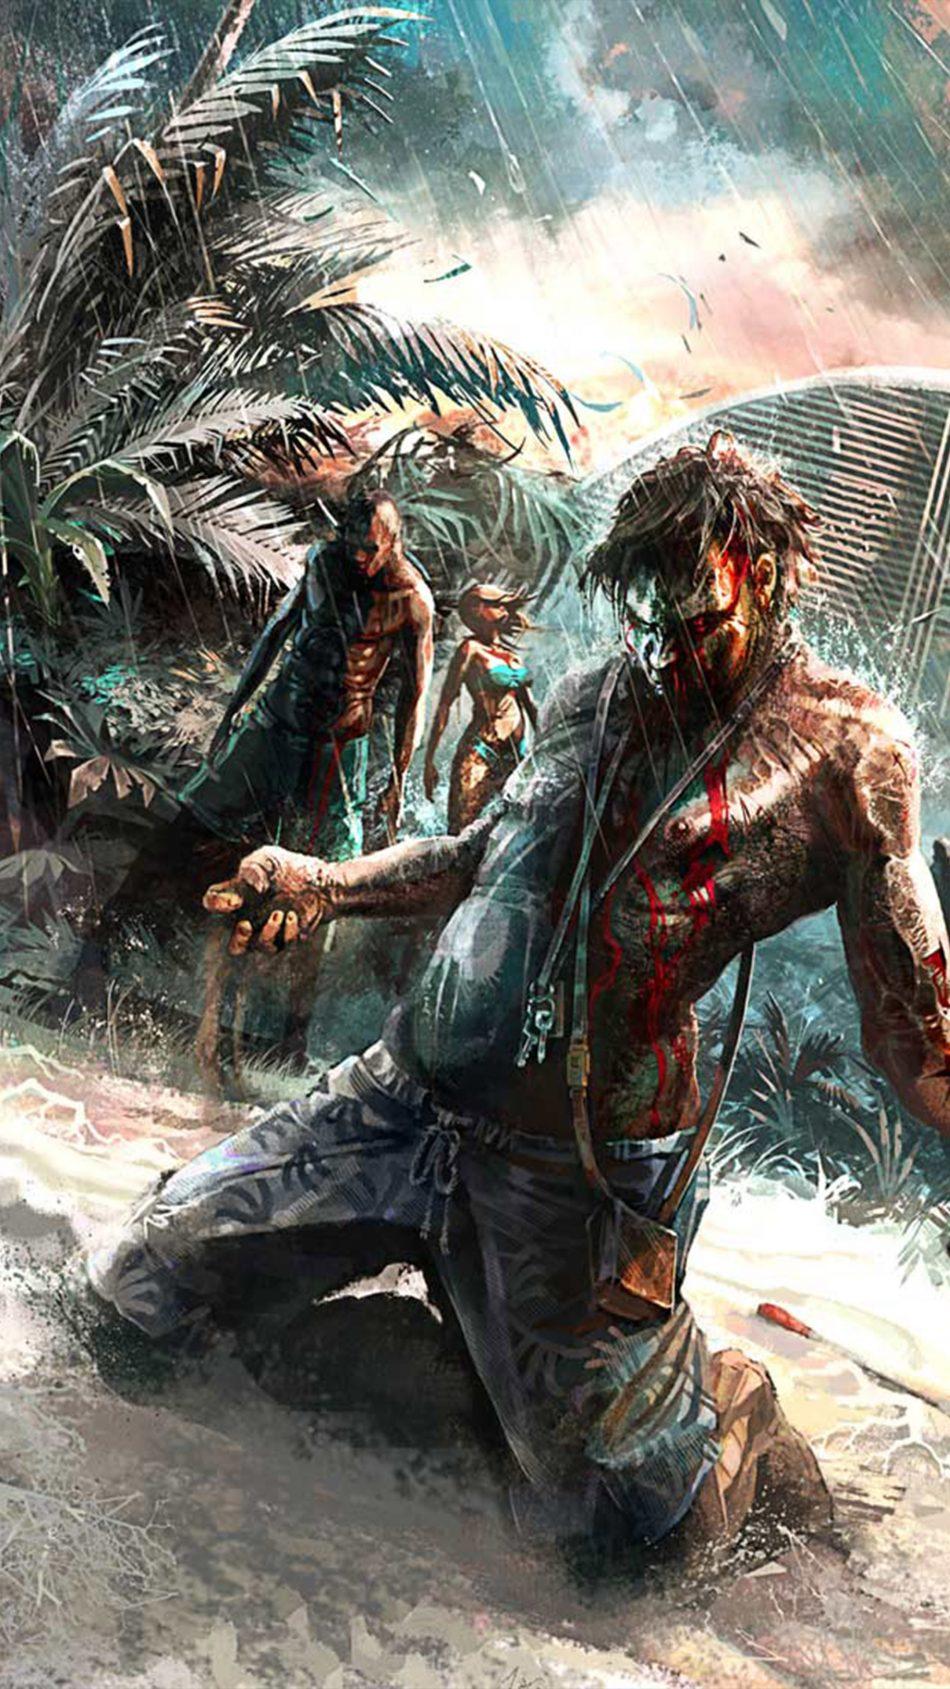 Dead Island Survival Game 4k Ultra Hd Mobile Wallpaper